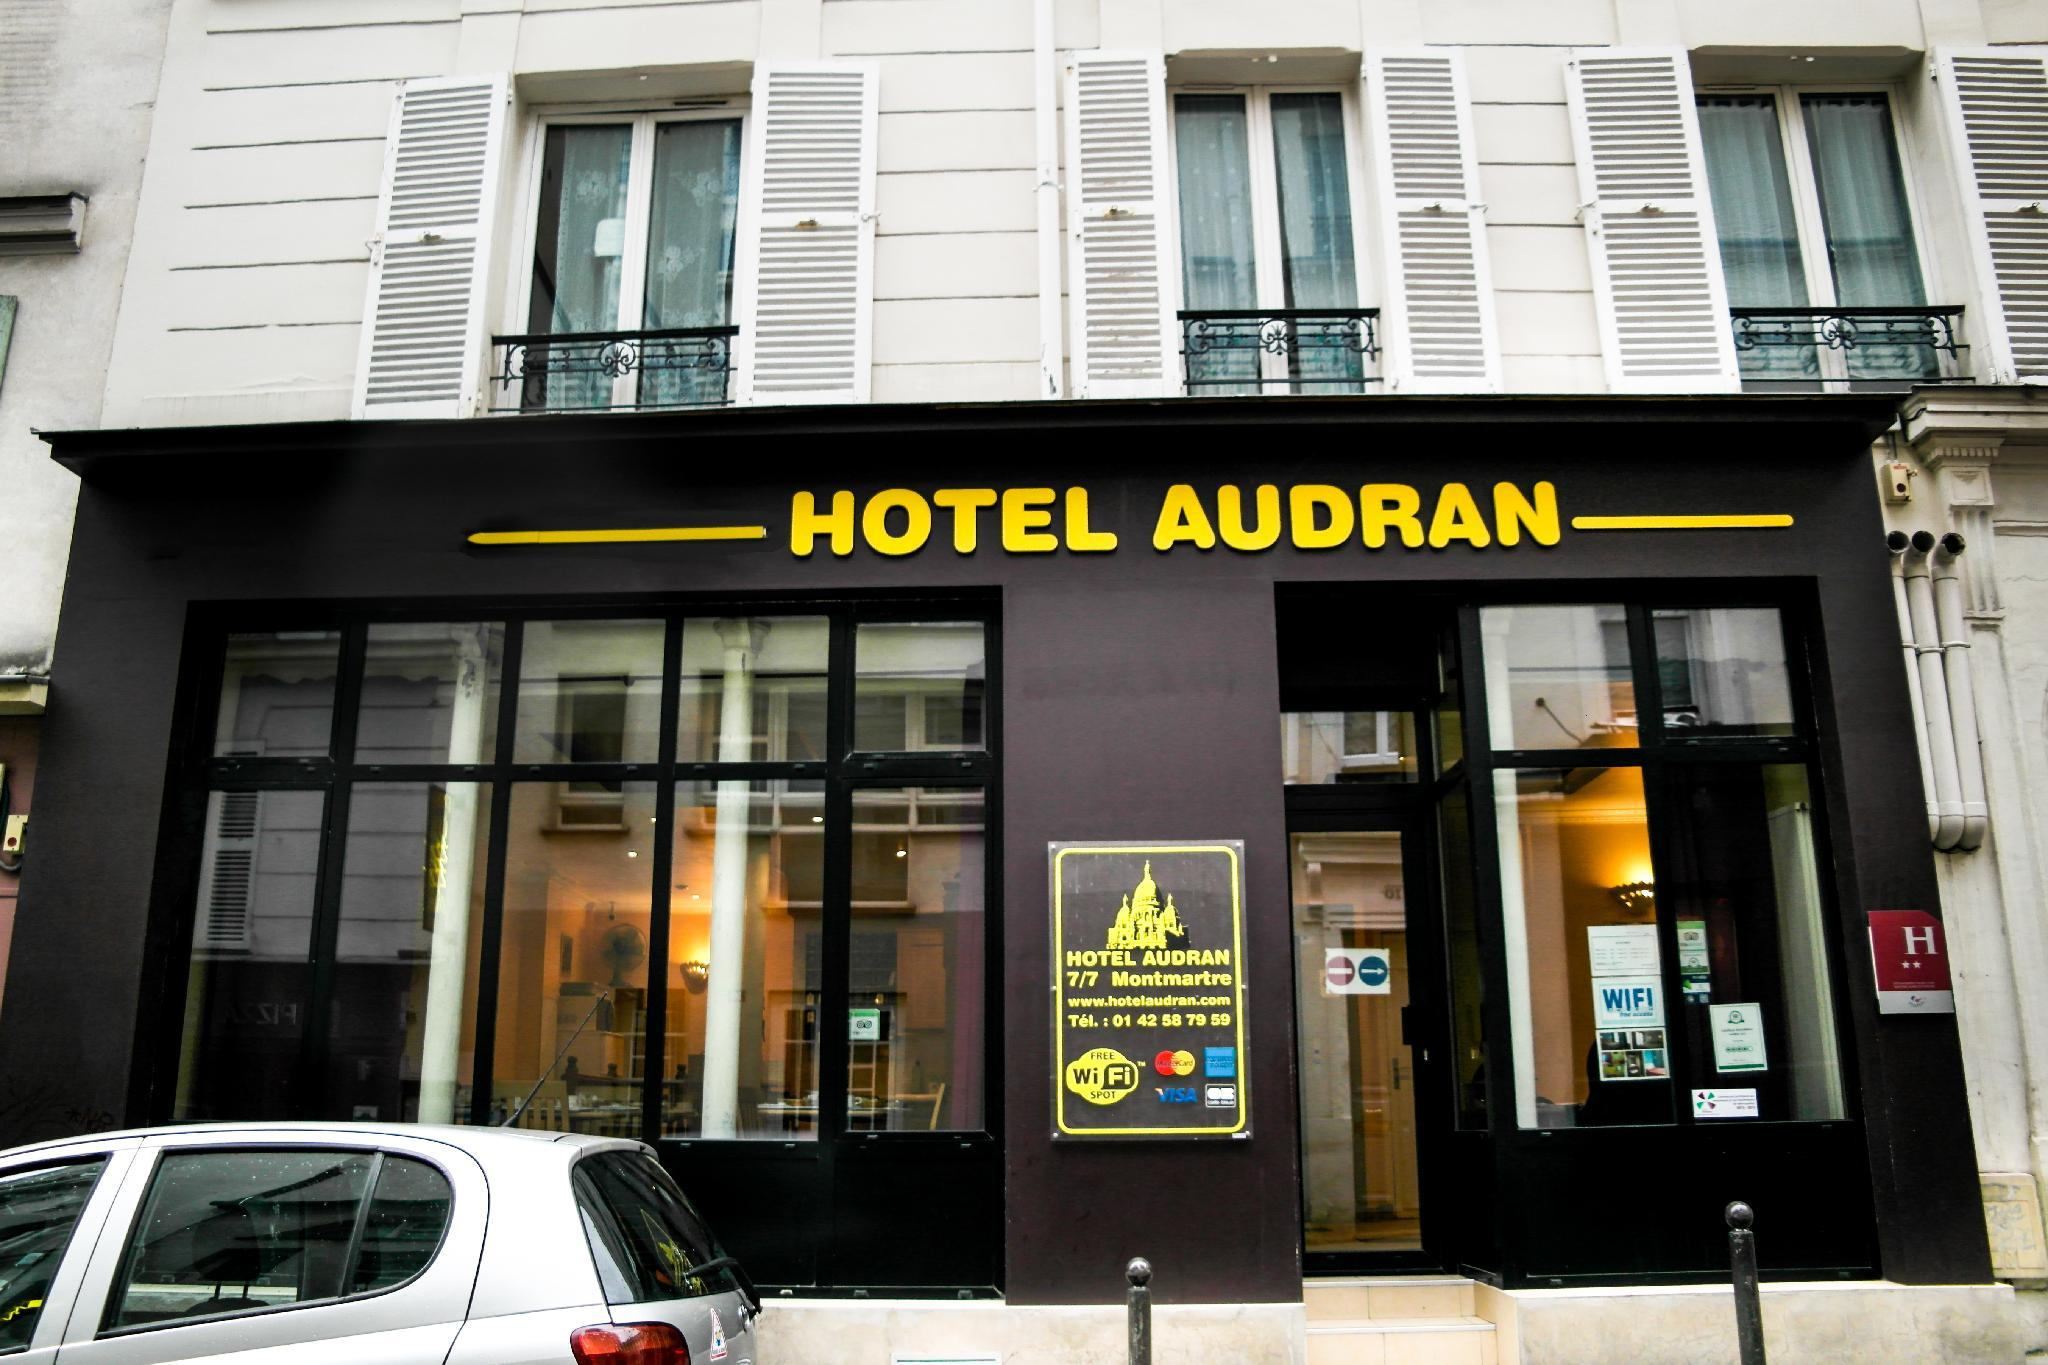 Audran Hotel